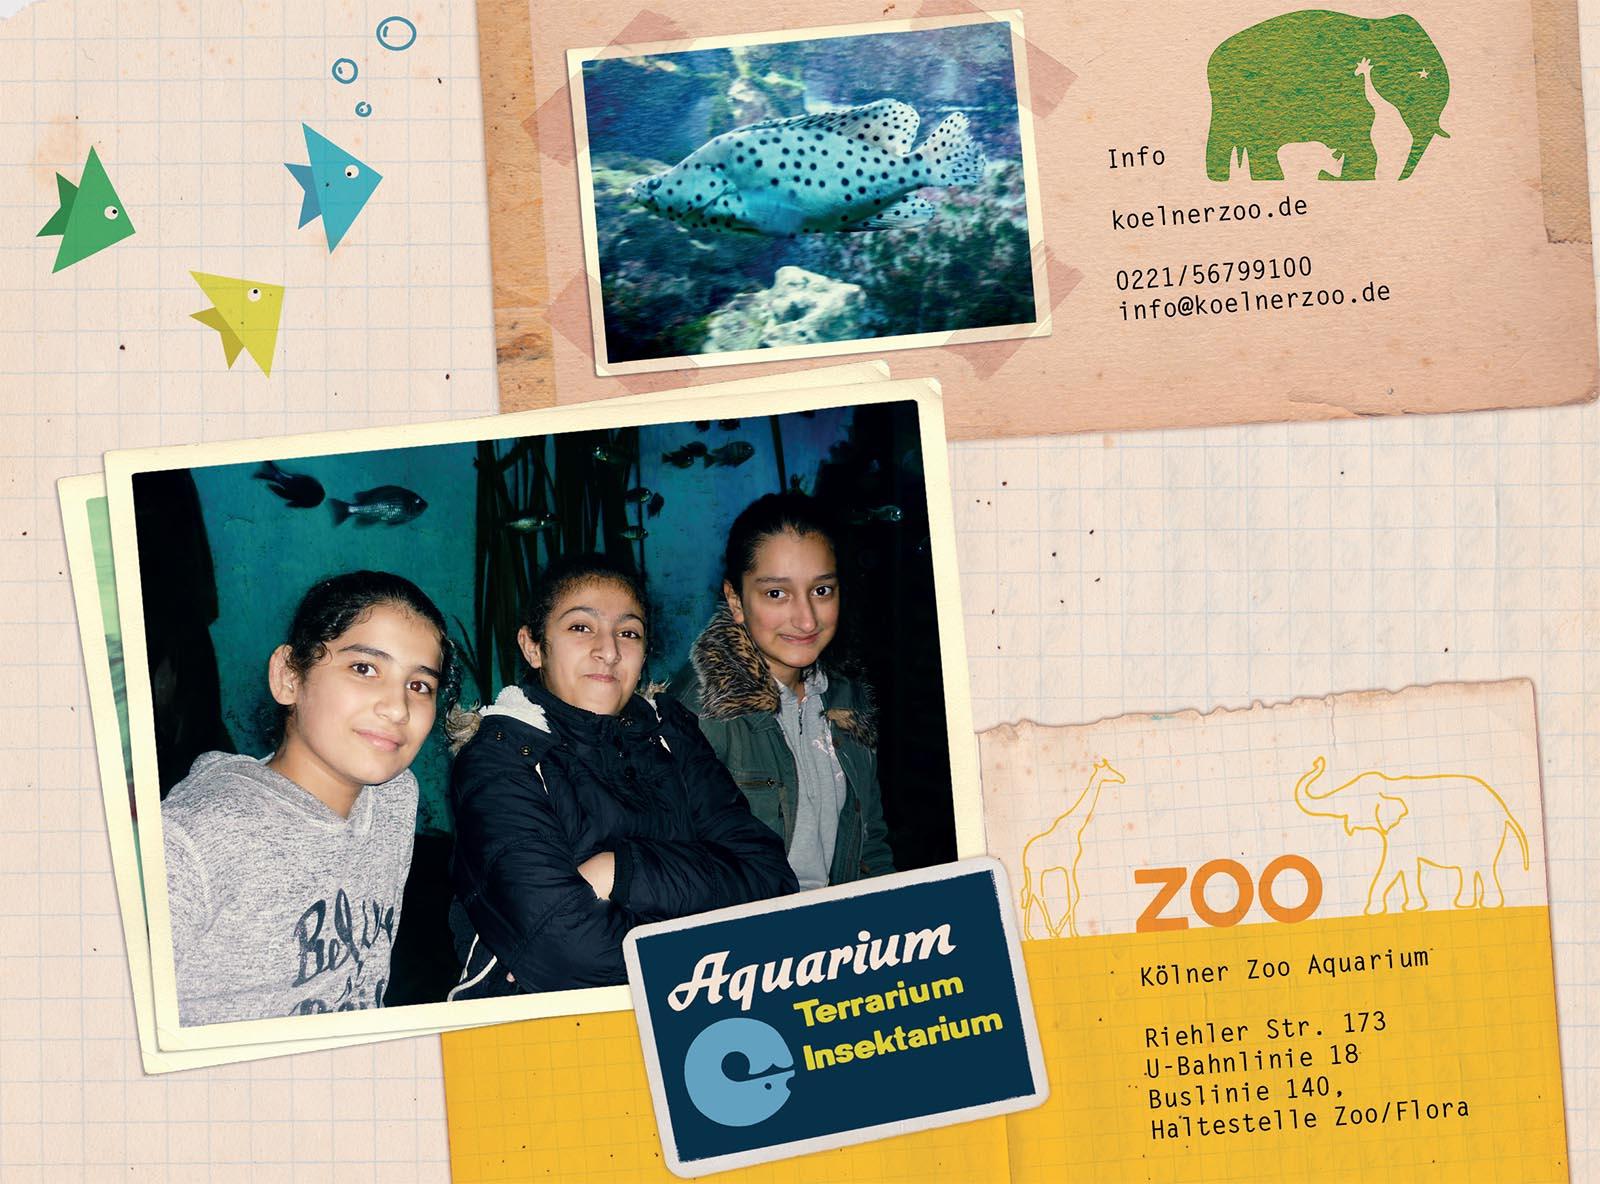 Kölner Zoo und Aquarium